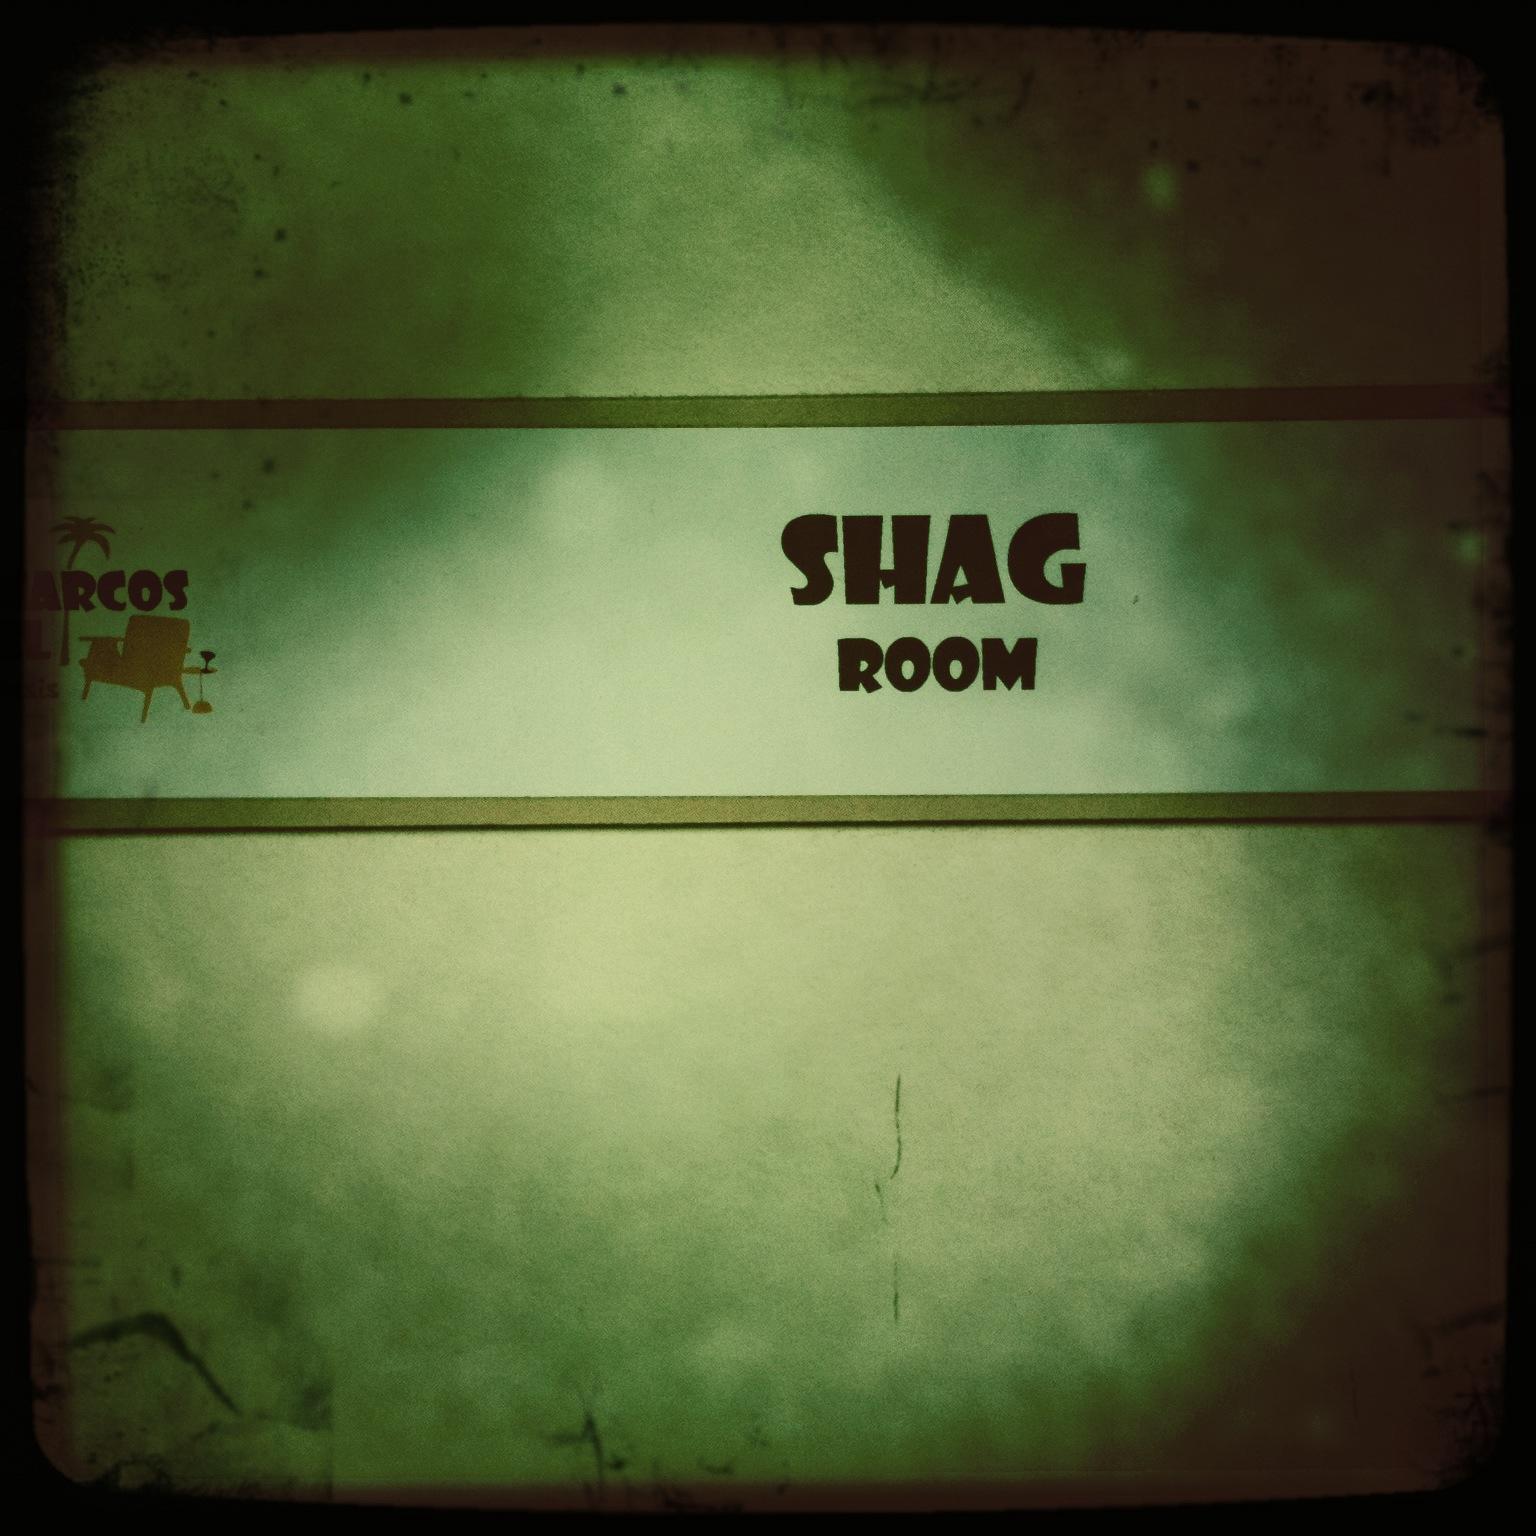 Find a shag tonight